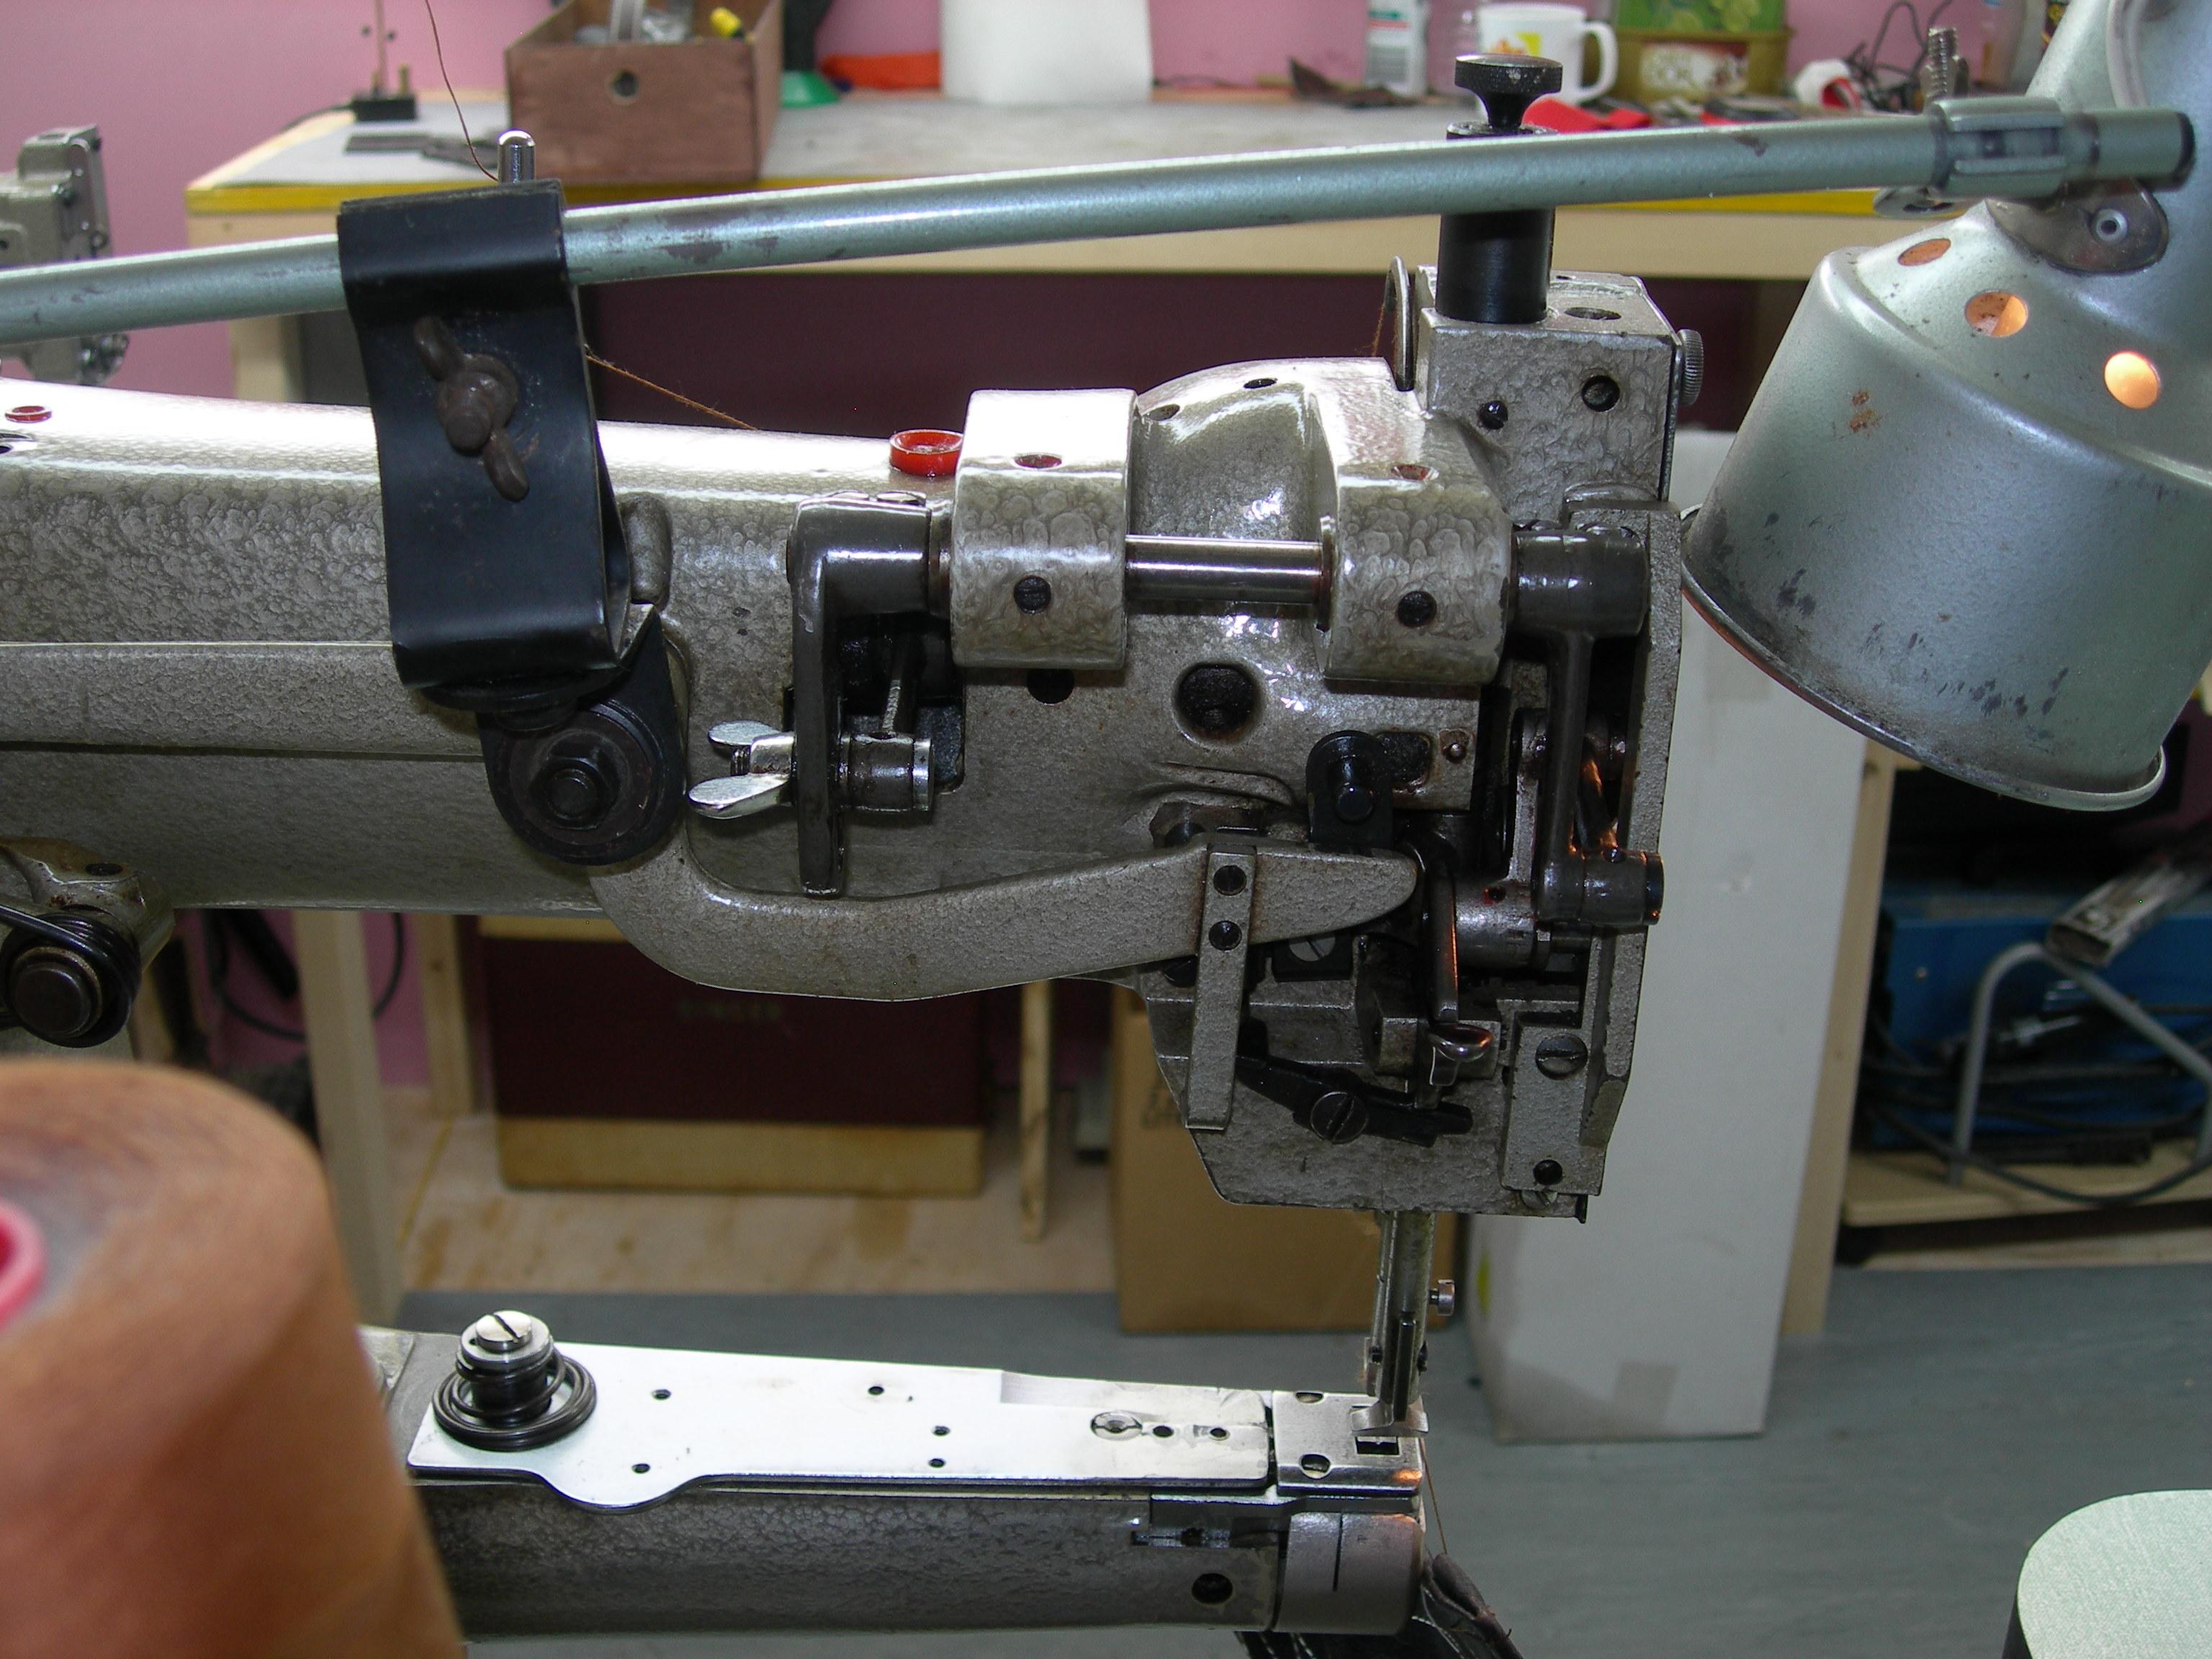 pfaff 335 industrial sewing machine